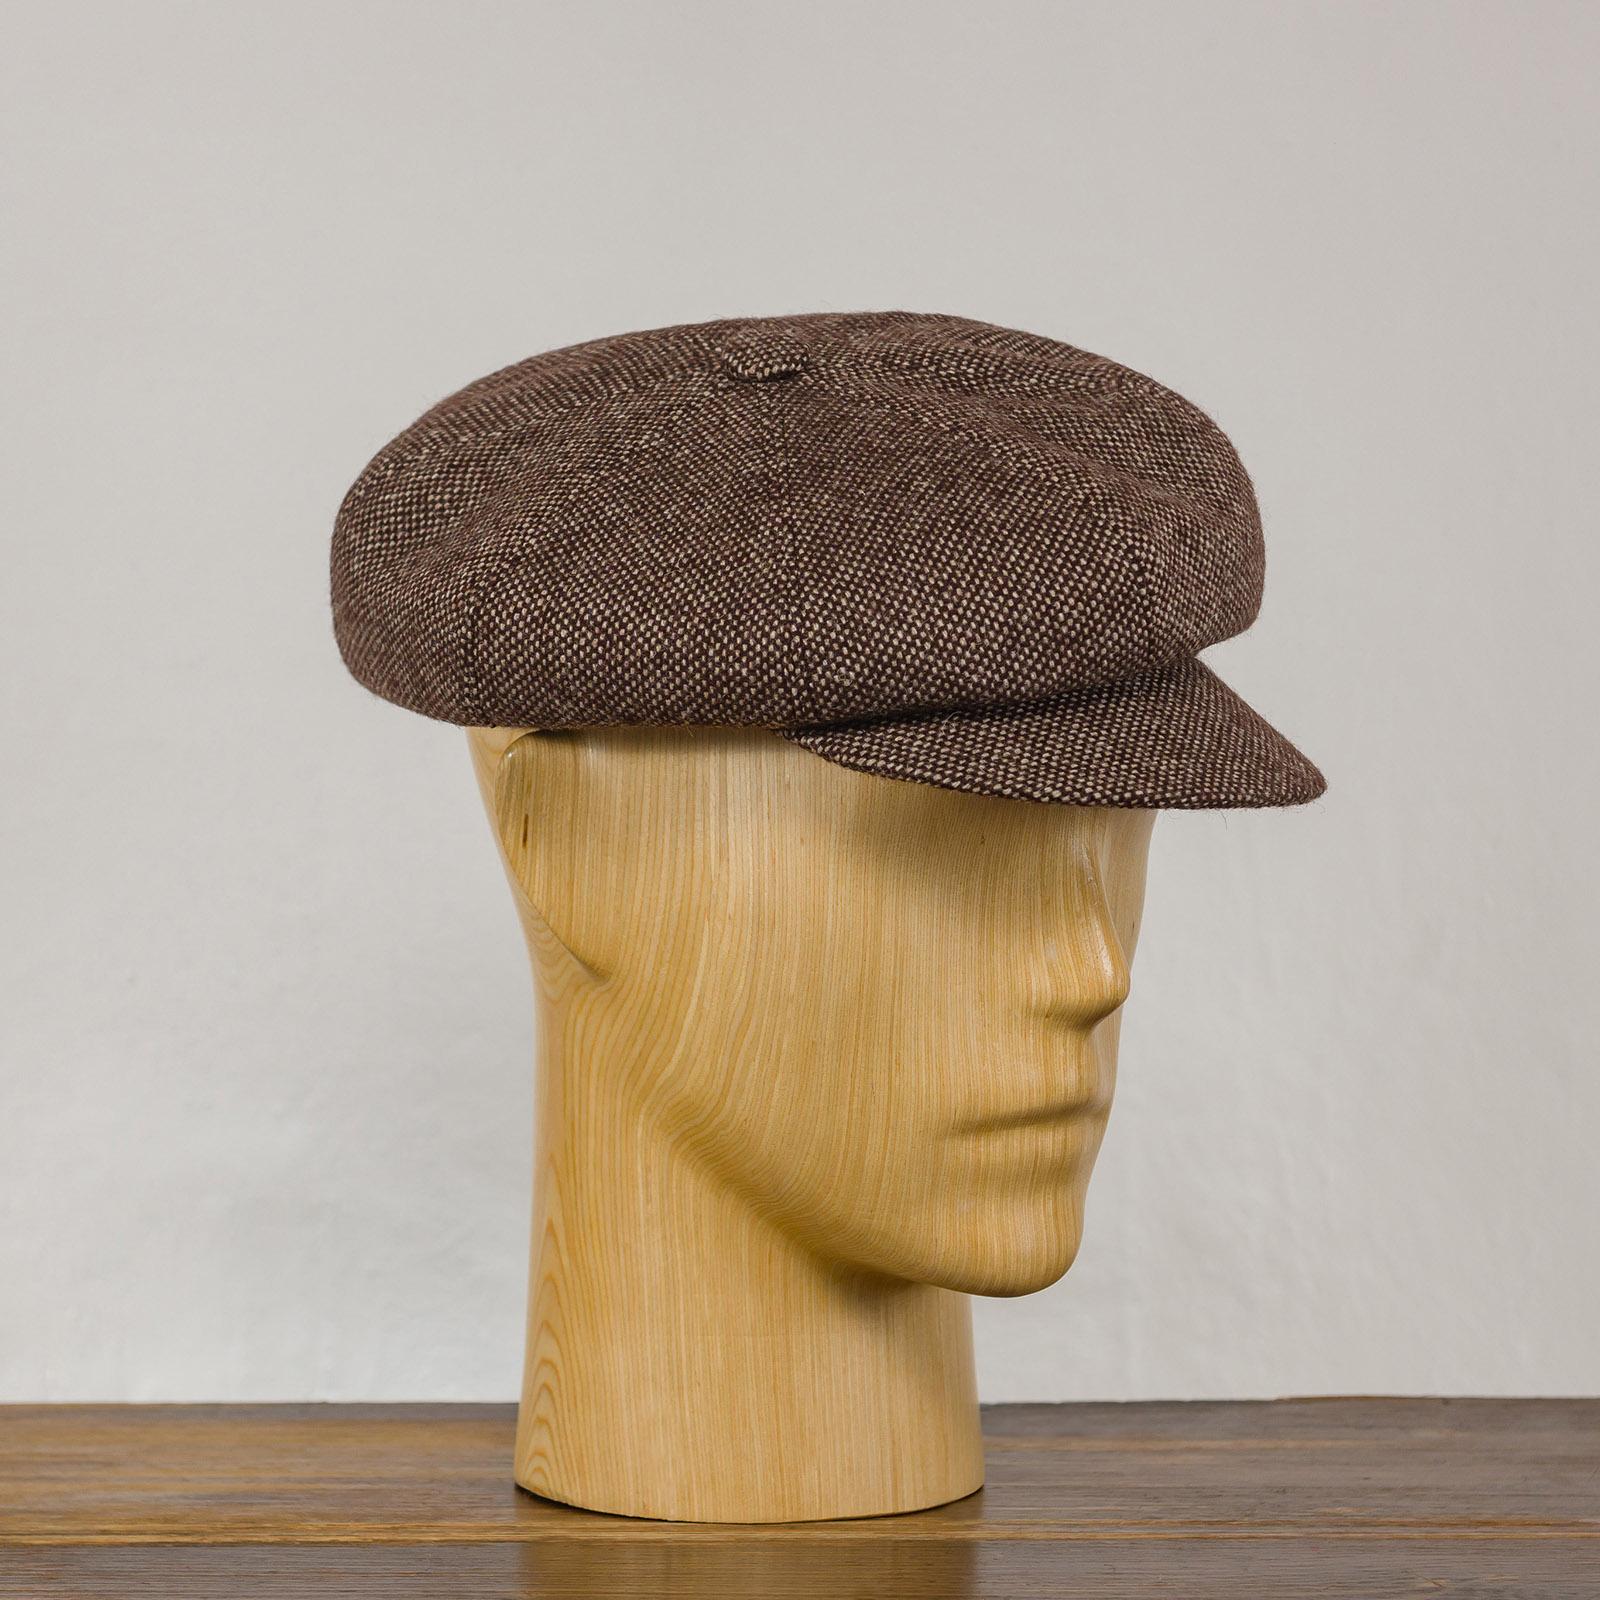 Tweed wool cloth newsboy 8 panels peaked cap applejack hooligan ivy poor baker boy Gatsby balloon prohibition driver hat